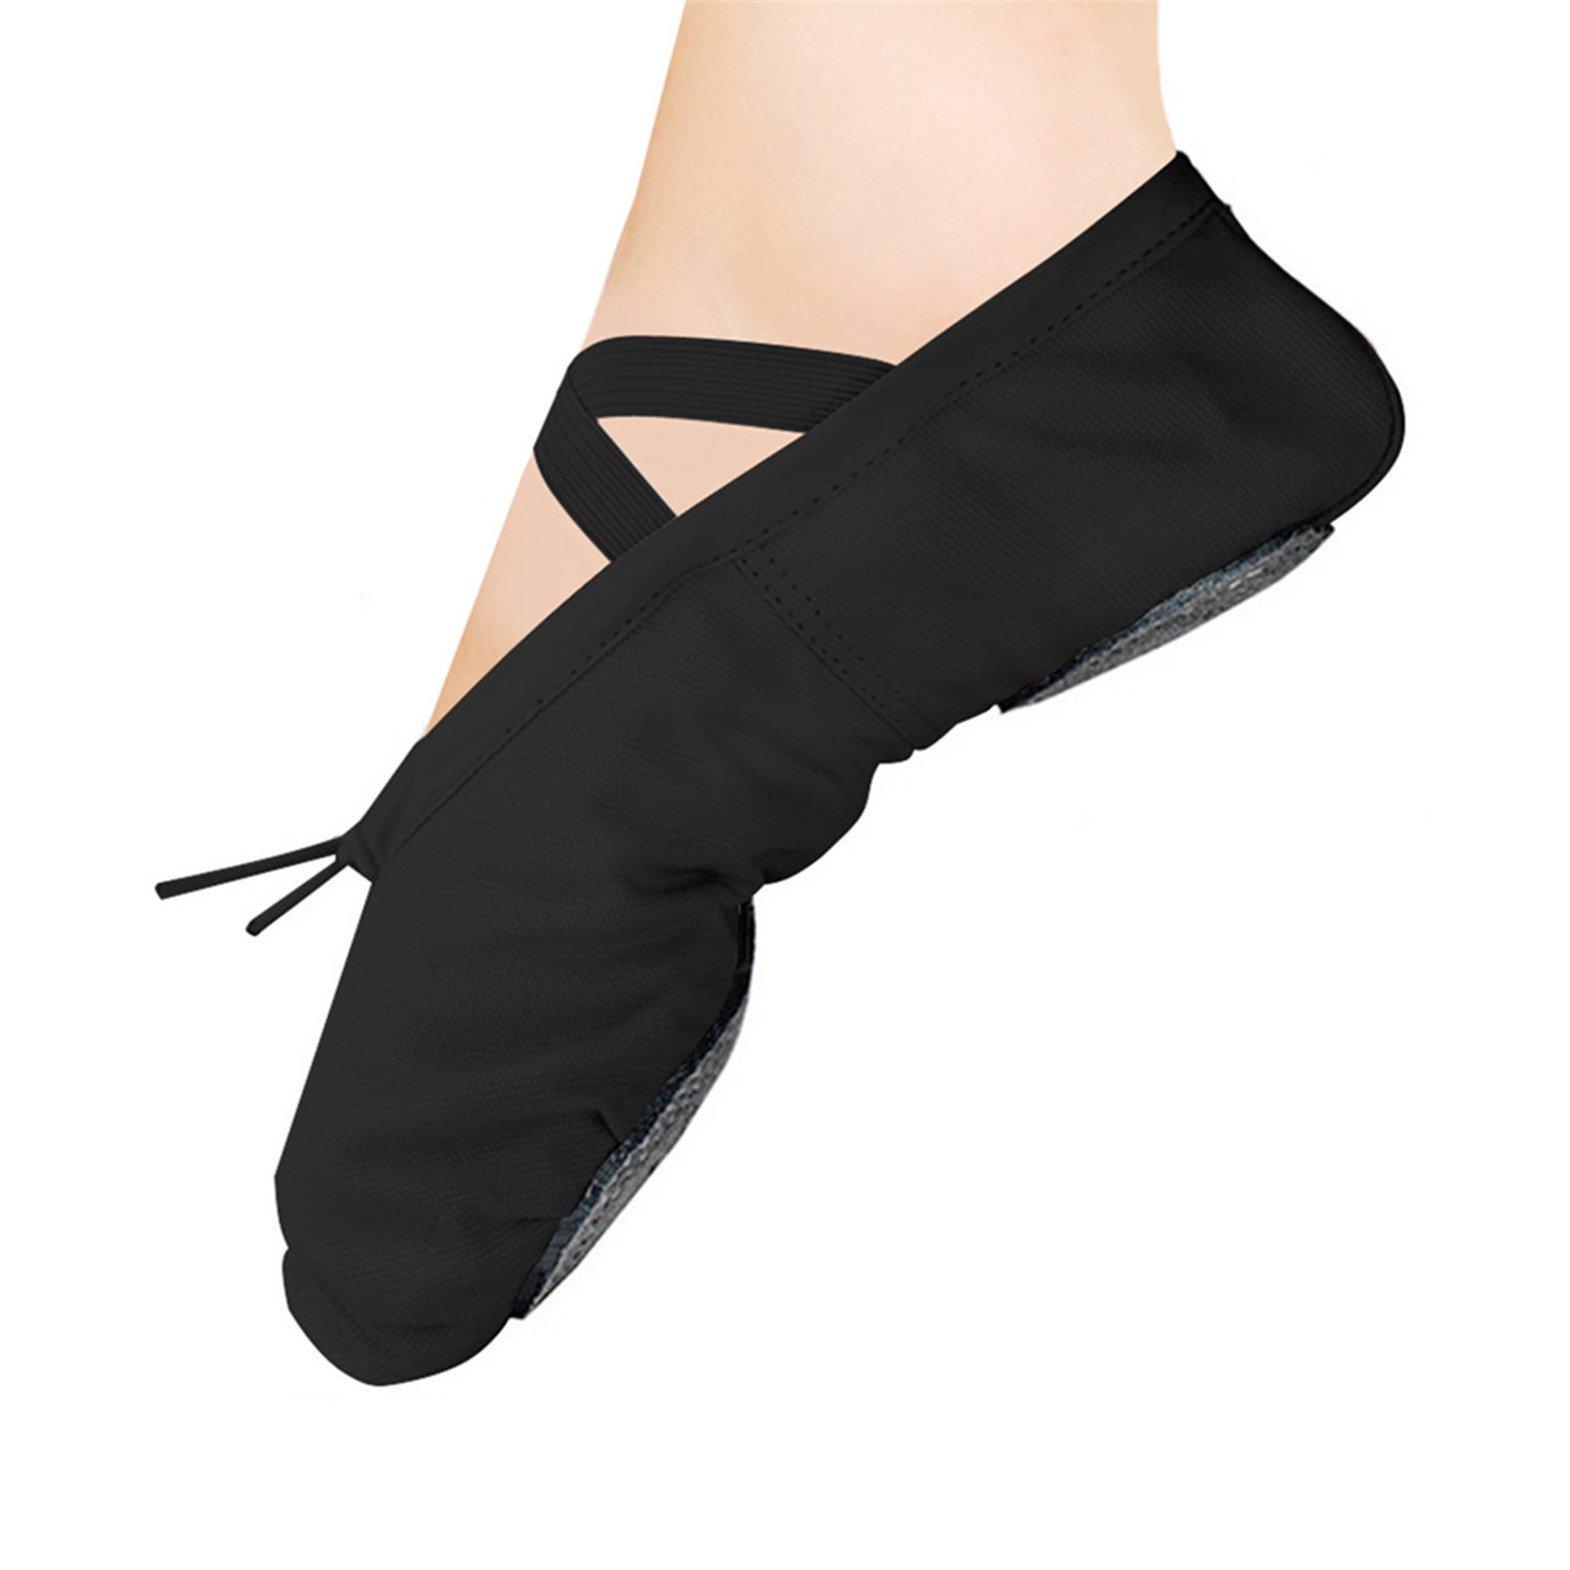 WELOVE Ballet Slipper Shoes Pointe Canvas Split Sole Practice Ballerina Flat (US8.5 for Women, Black)